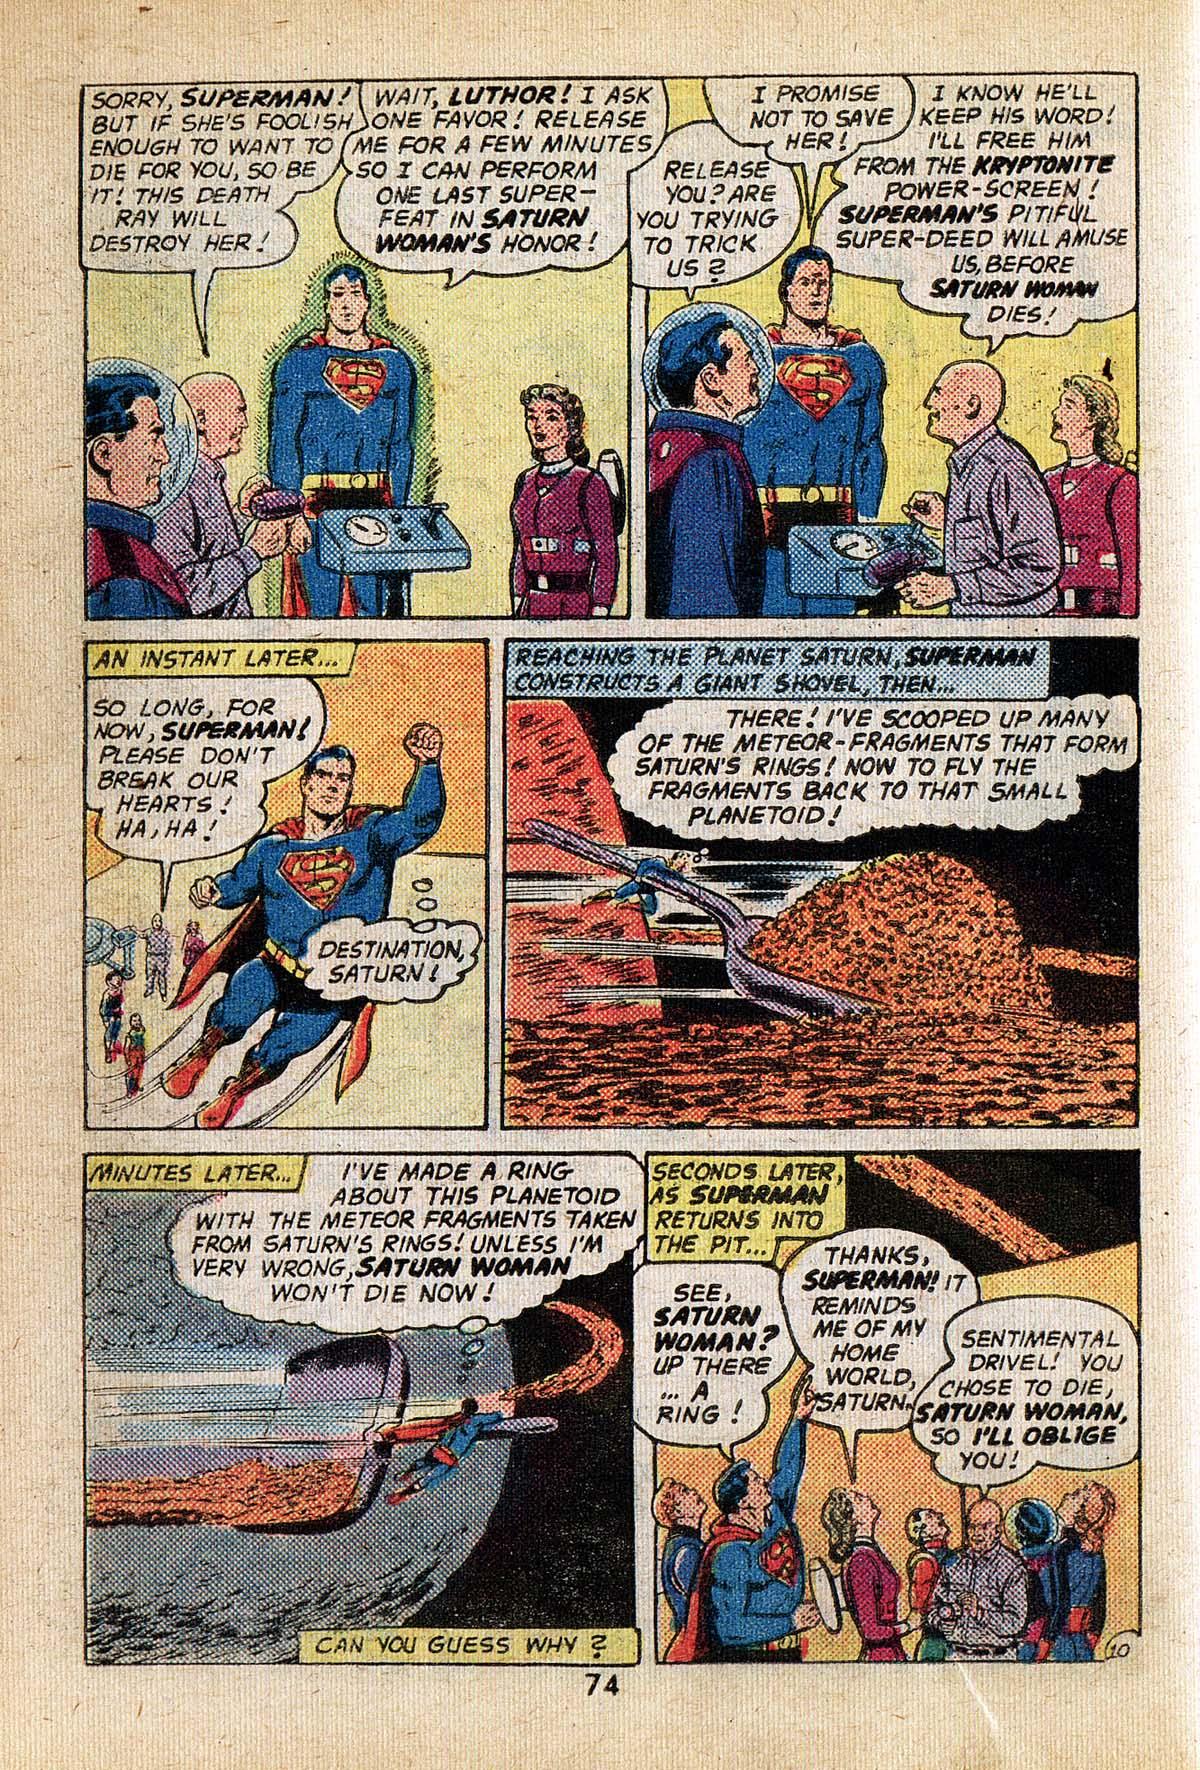 Read online Adventure Comics (1938) comic -  Issue #494 - 74